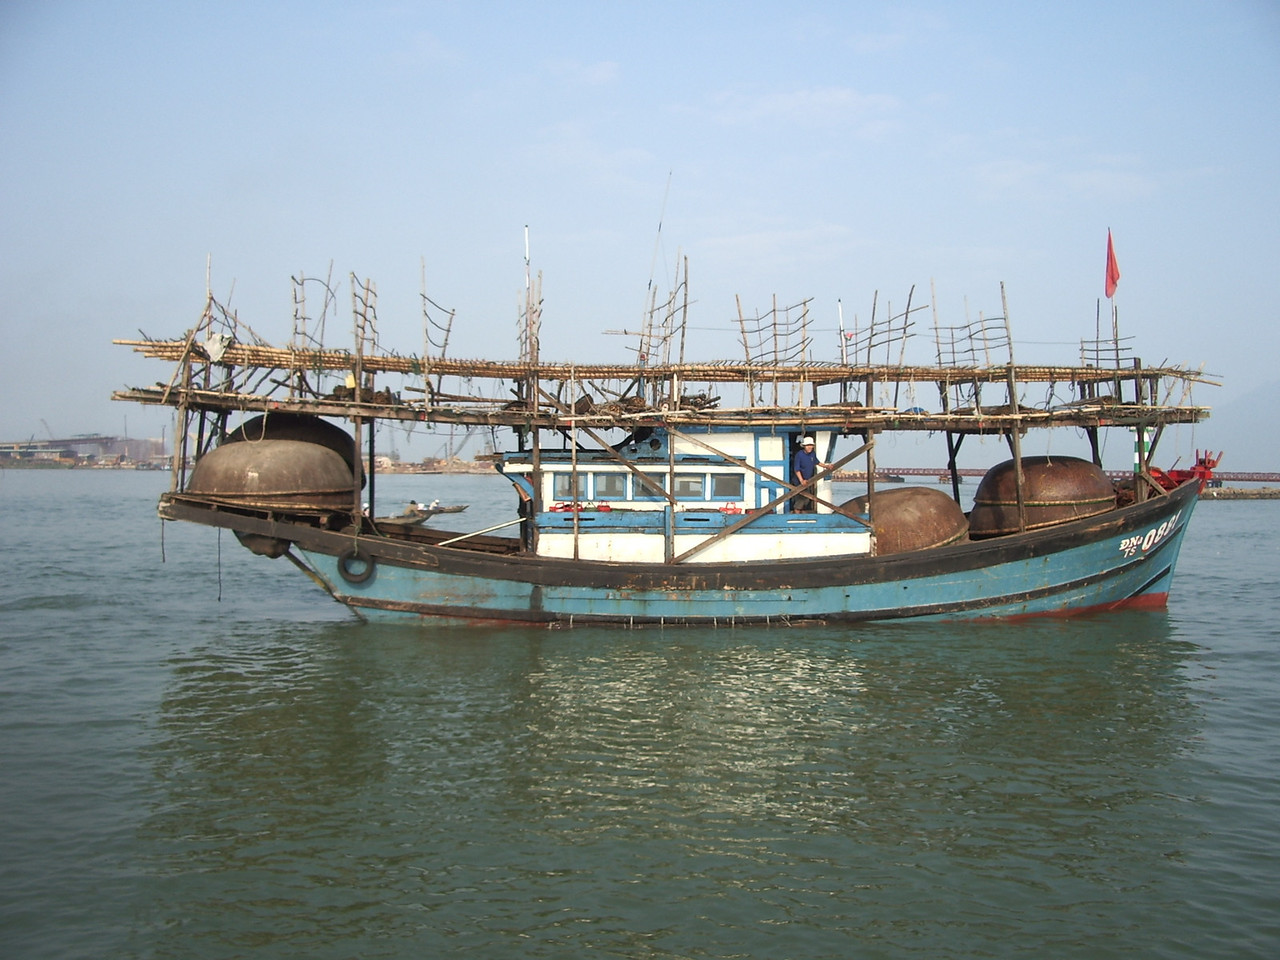 Fishing boat on the Han River in Da Nang.